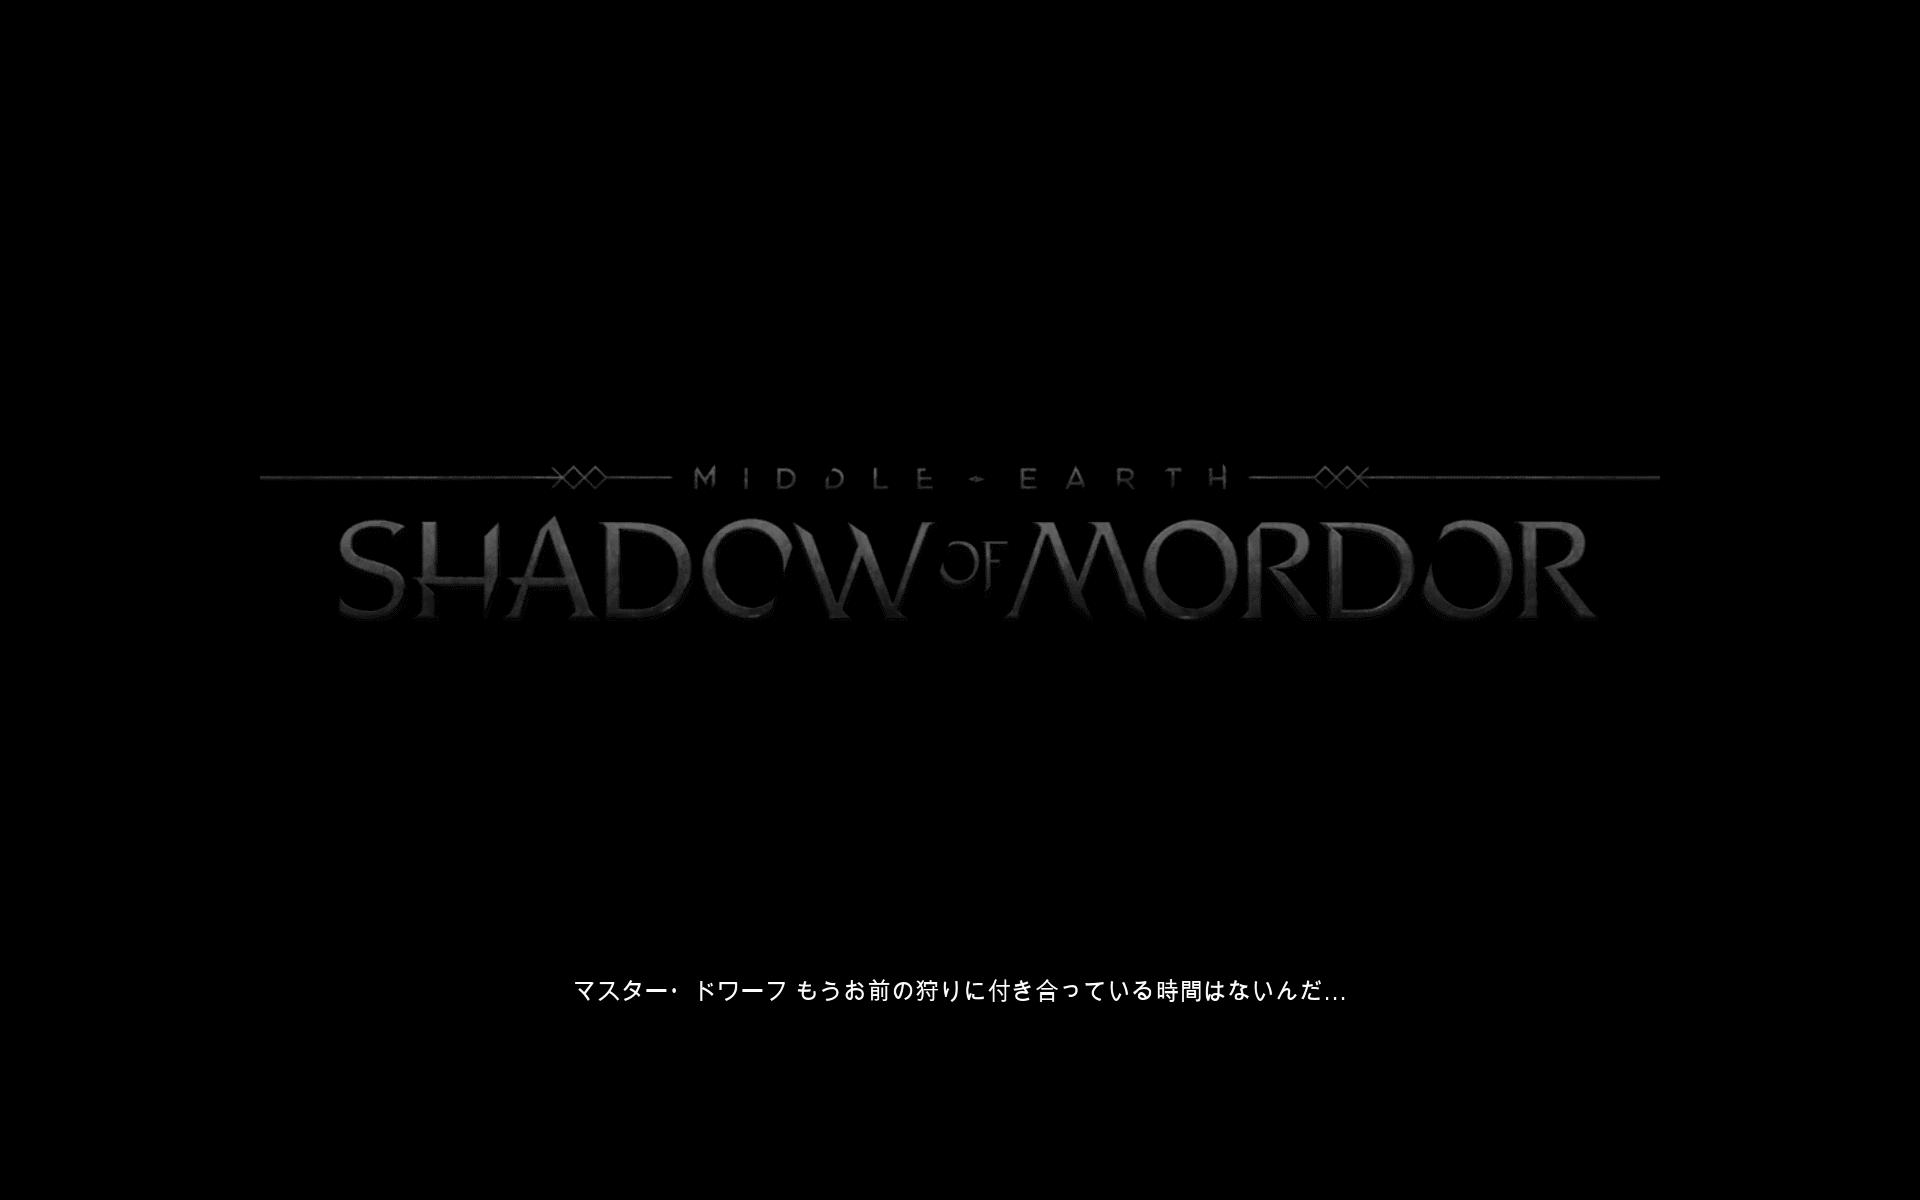 PC ゲーム Middle-earth: Shadow of Mordor GOTY 日本語化とフォント変更方法と DLC The Bright Lord(明王)で日本語を表示する方法、PC ゲーム Middle-earth: Shadow of Mordor GOTY - DLC Lord of the Hunt(狩りの王)オープニングタイトルロゴ表示修正方法、日本語翻訳ファイル globalresources_en.embb 修正後、日本語環境で DLC Lord of the Hunt(狩りの王)ゲーム開始時のオープニングタイトルロゴが正常に表示したスクリーンショット